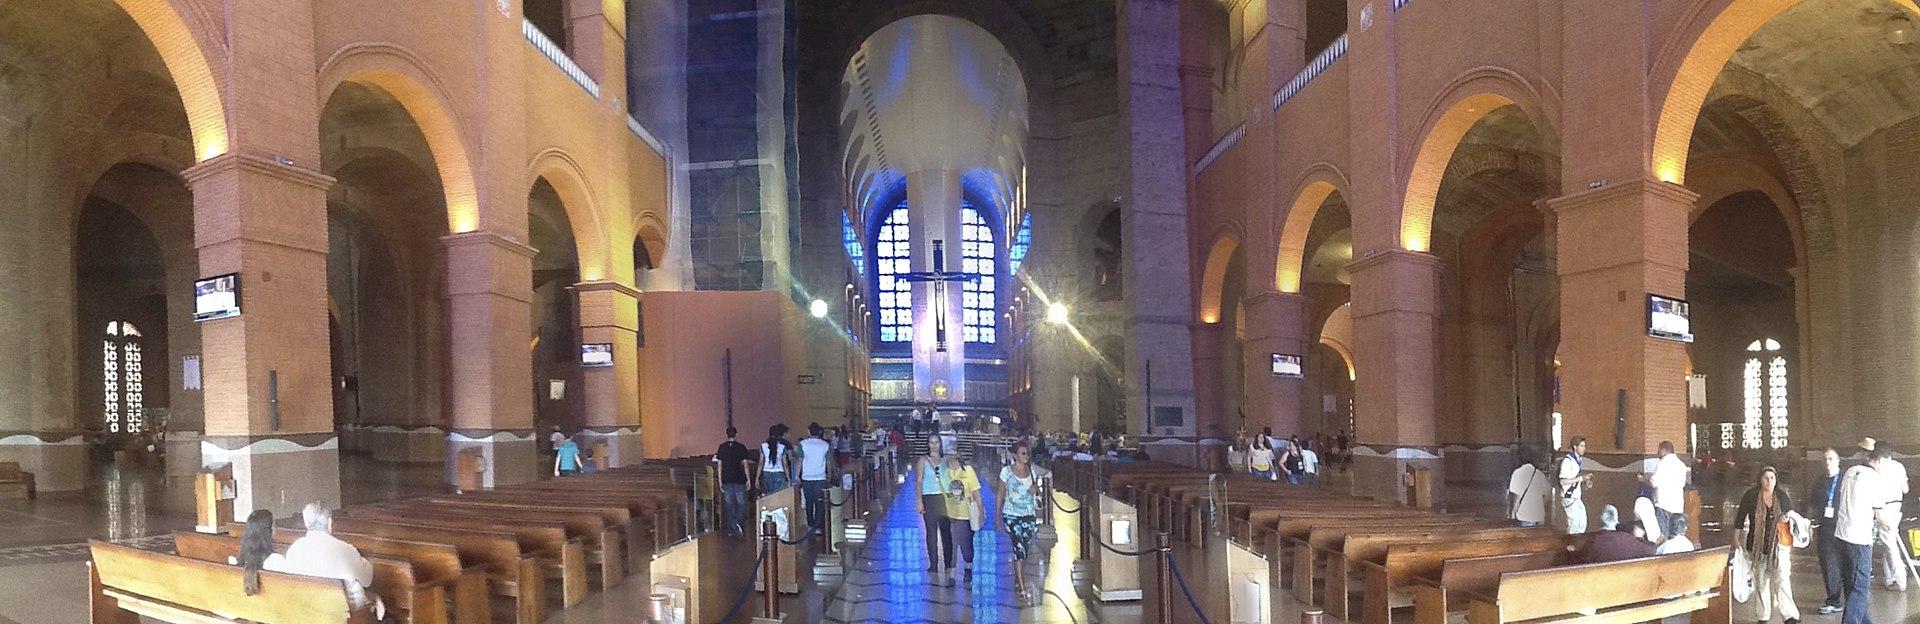 Santuário N. S. Aparecida - Aparecida SP (Interior) - panoramio (1).jpg